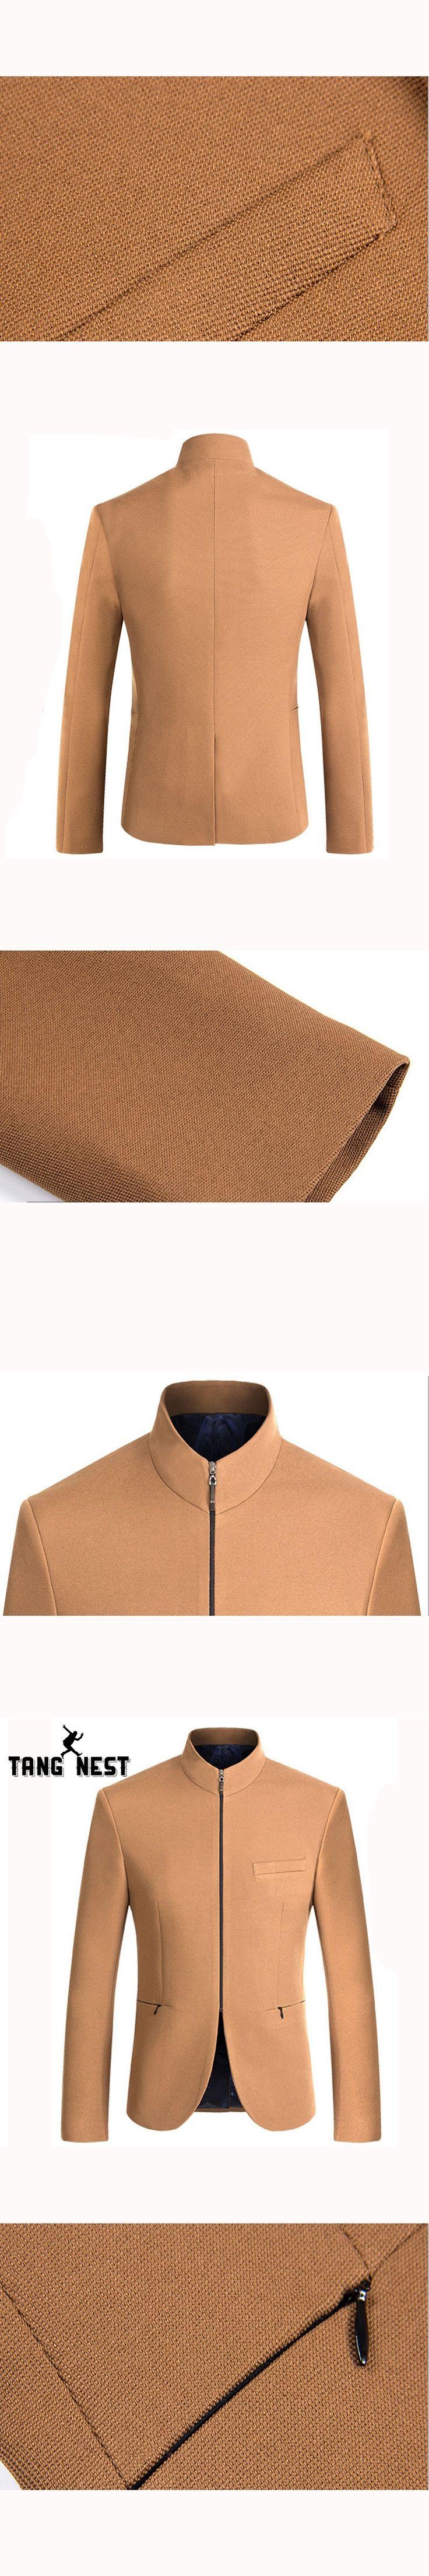 TANGNEST 2017 New Design Fashion Men Blazer Solid Color Blazer Masculino Slim Fit Asian Size XXL Casual Men Blazers MWX381